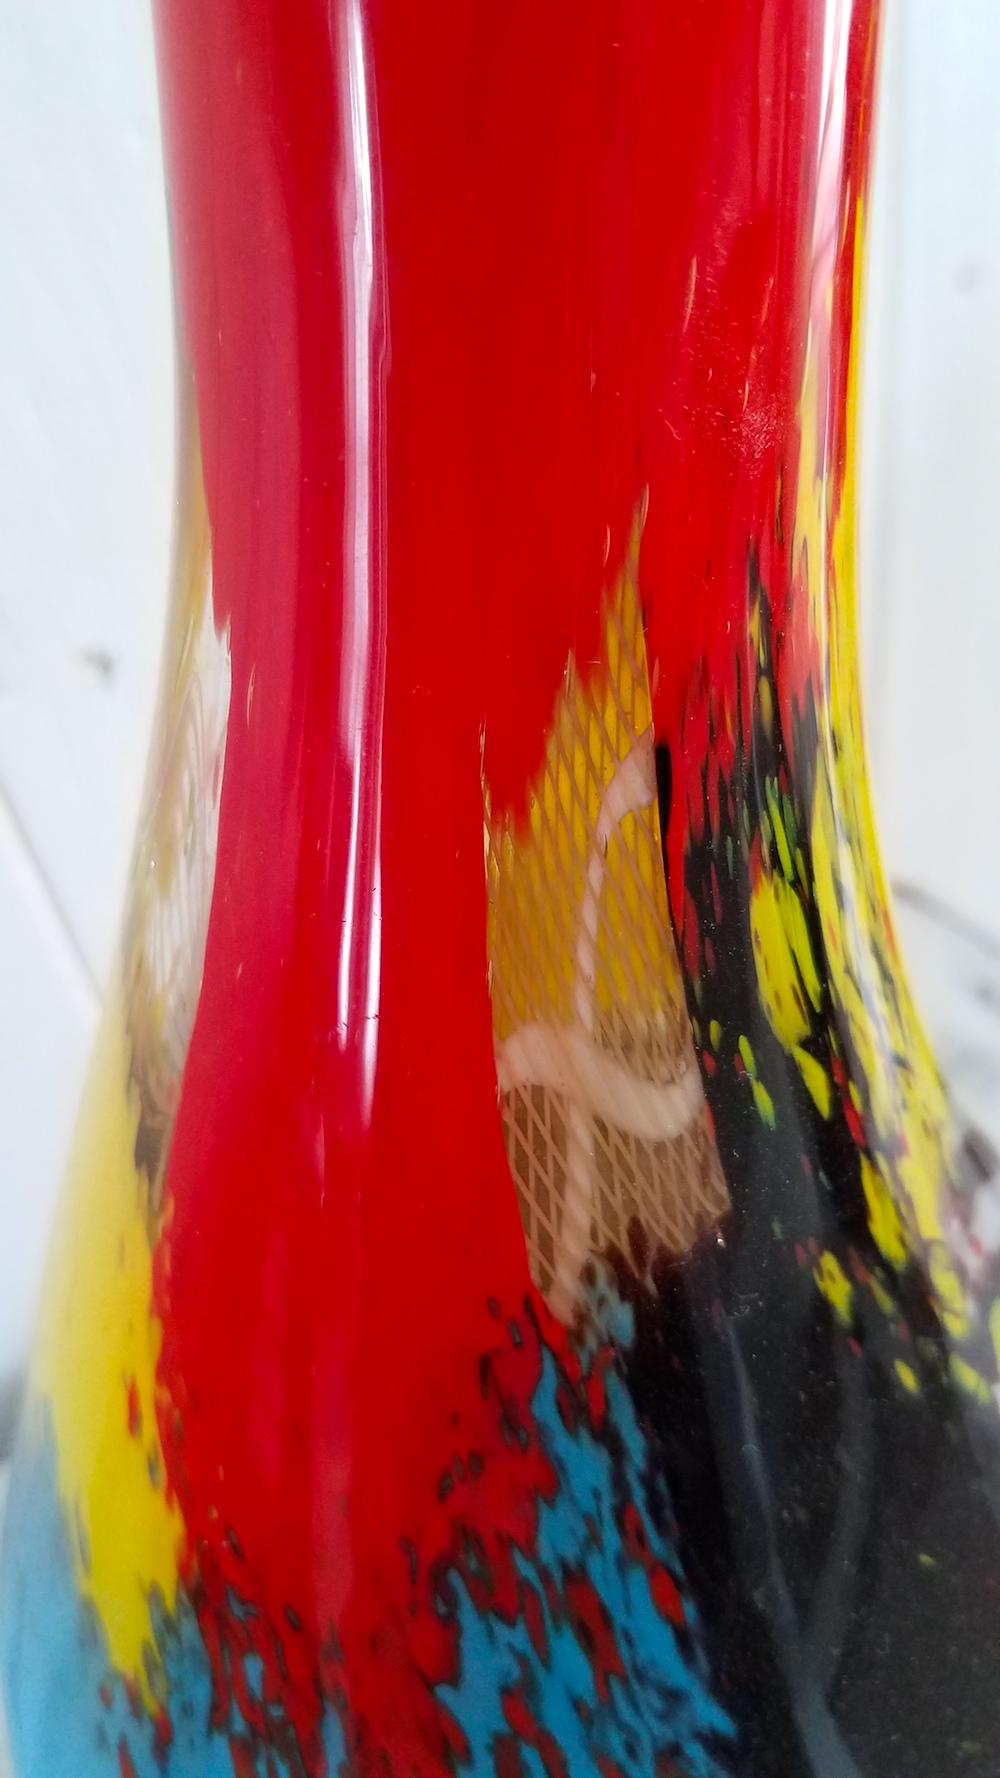 Martin-Vase-11.jpg